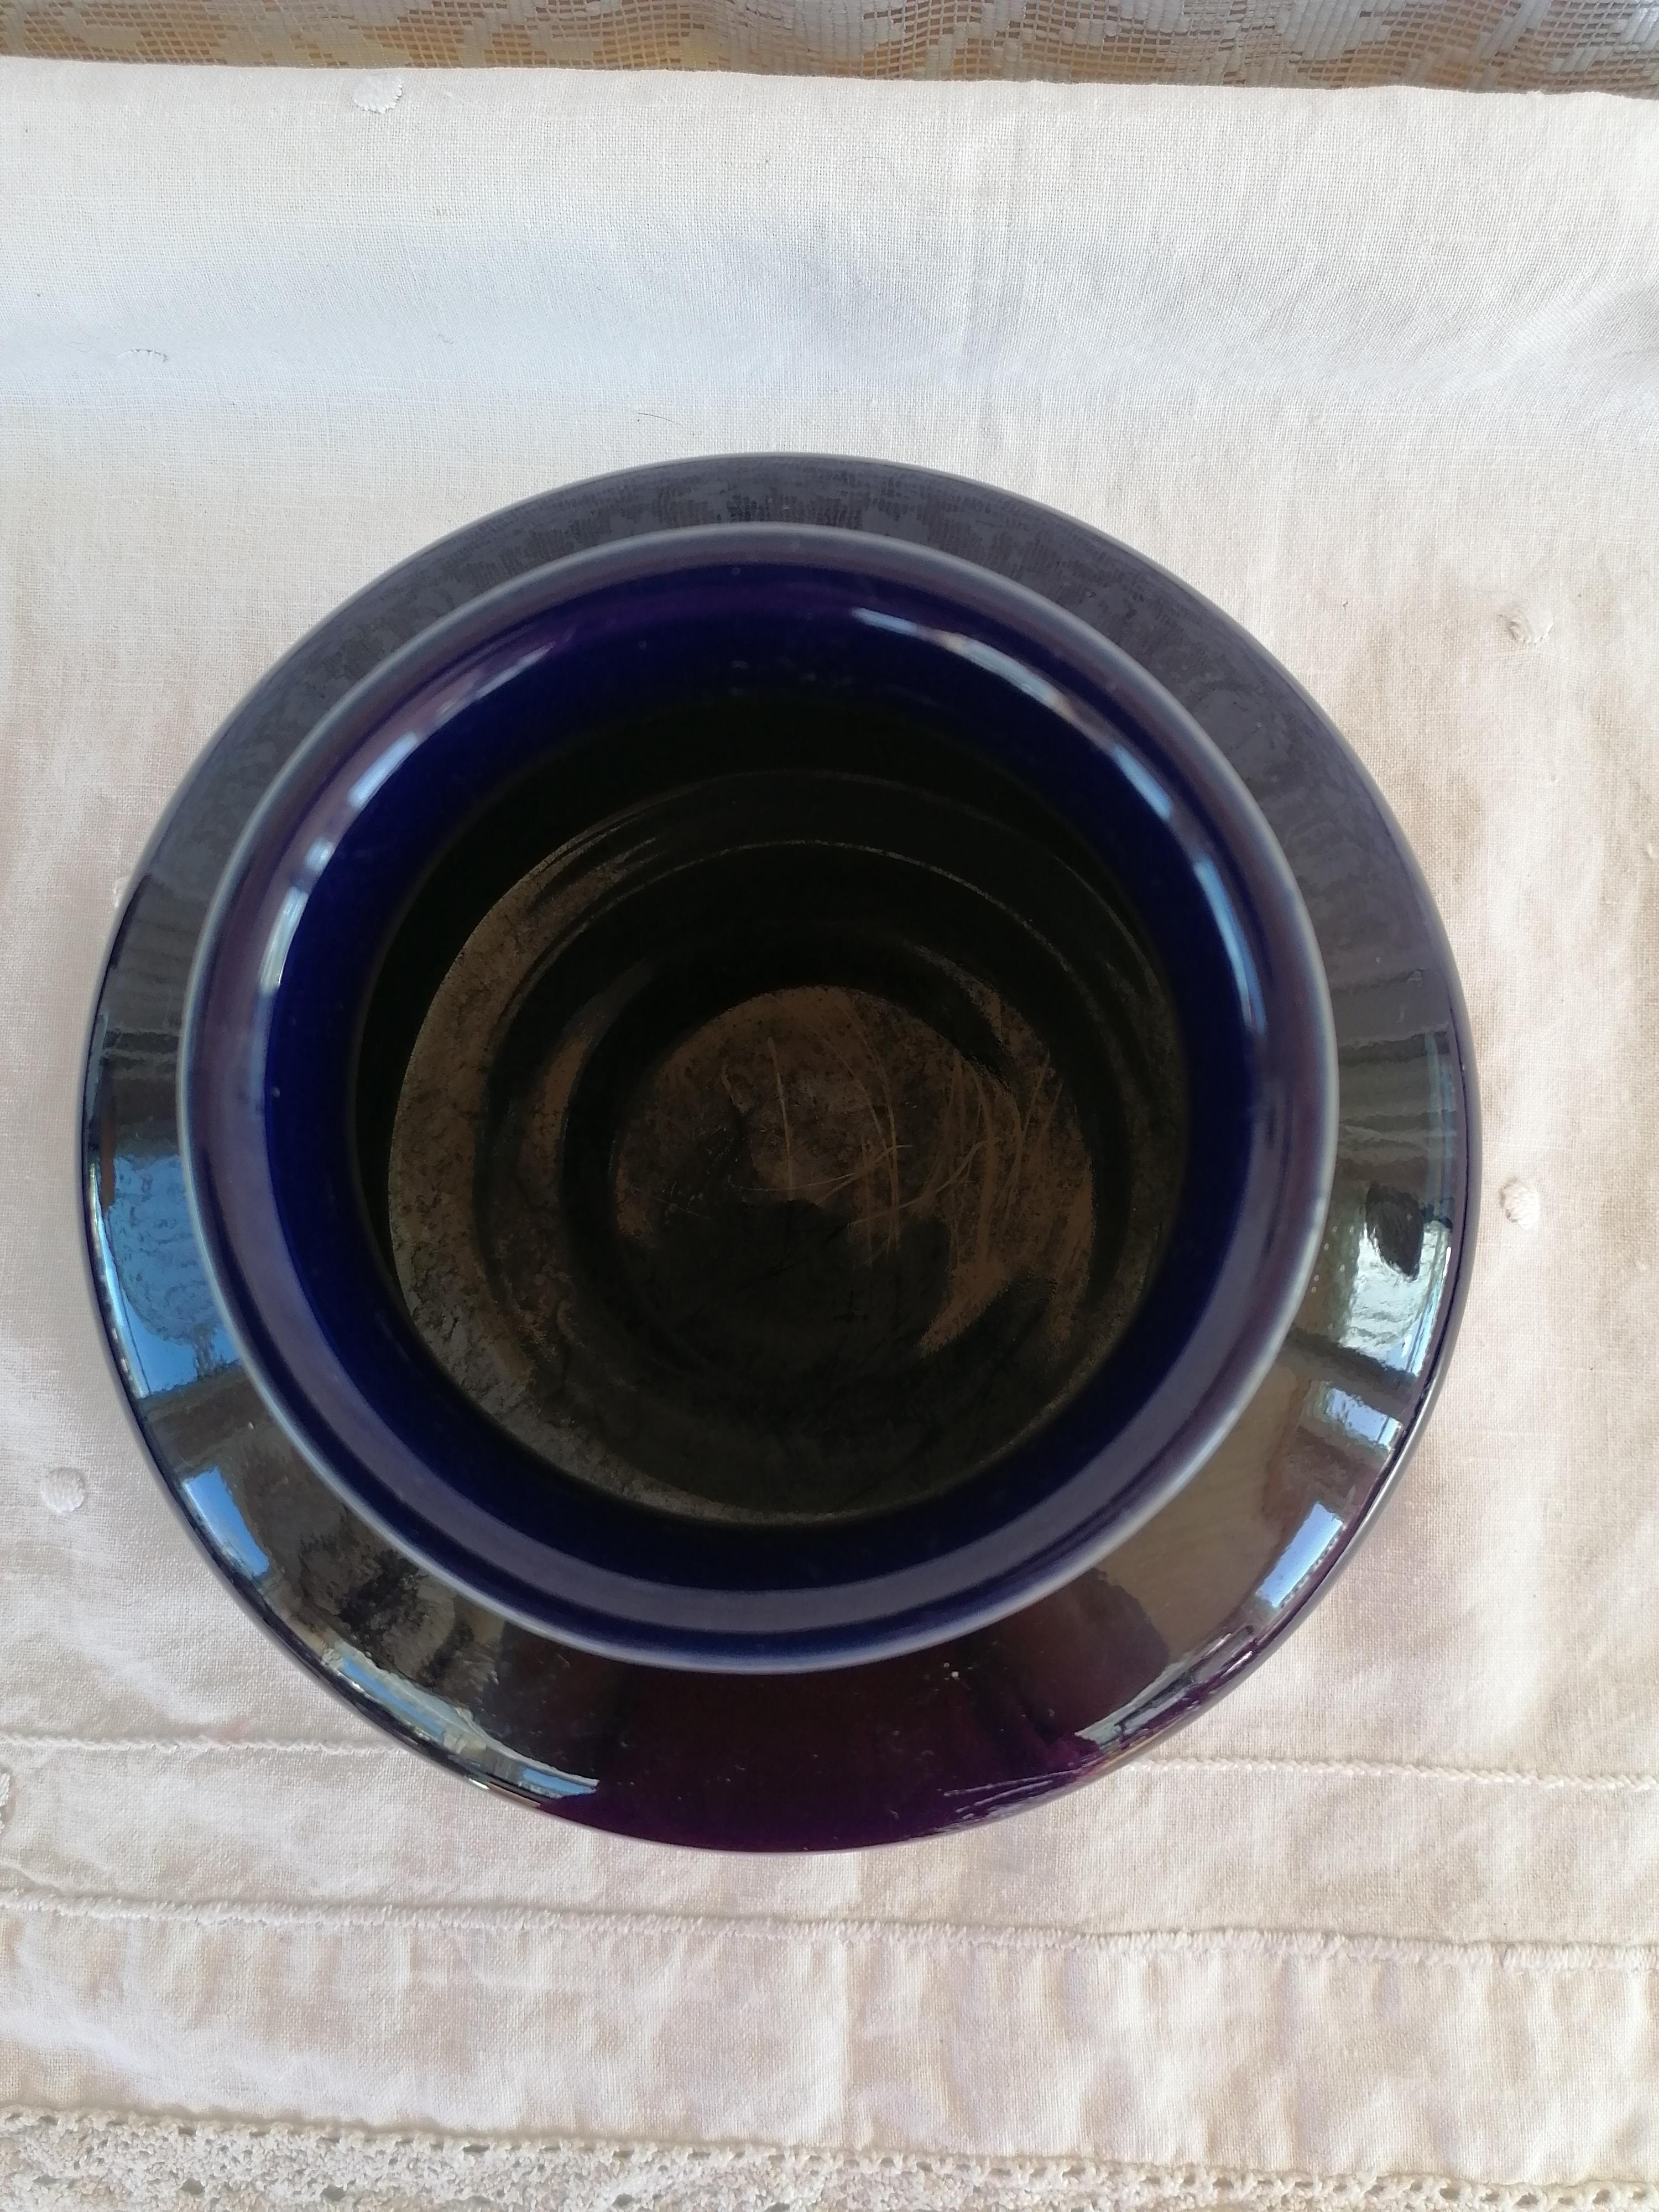 Risburk keramik